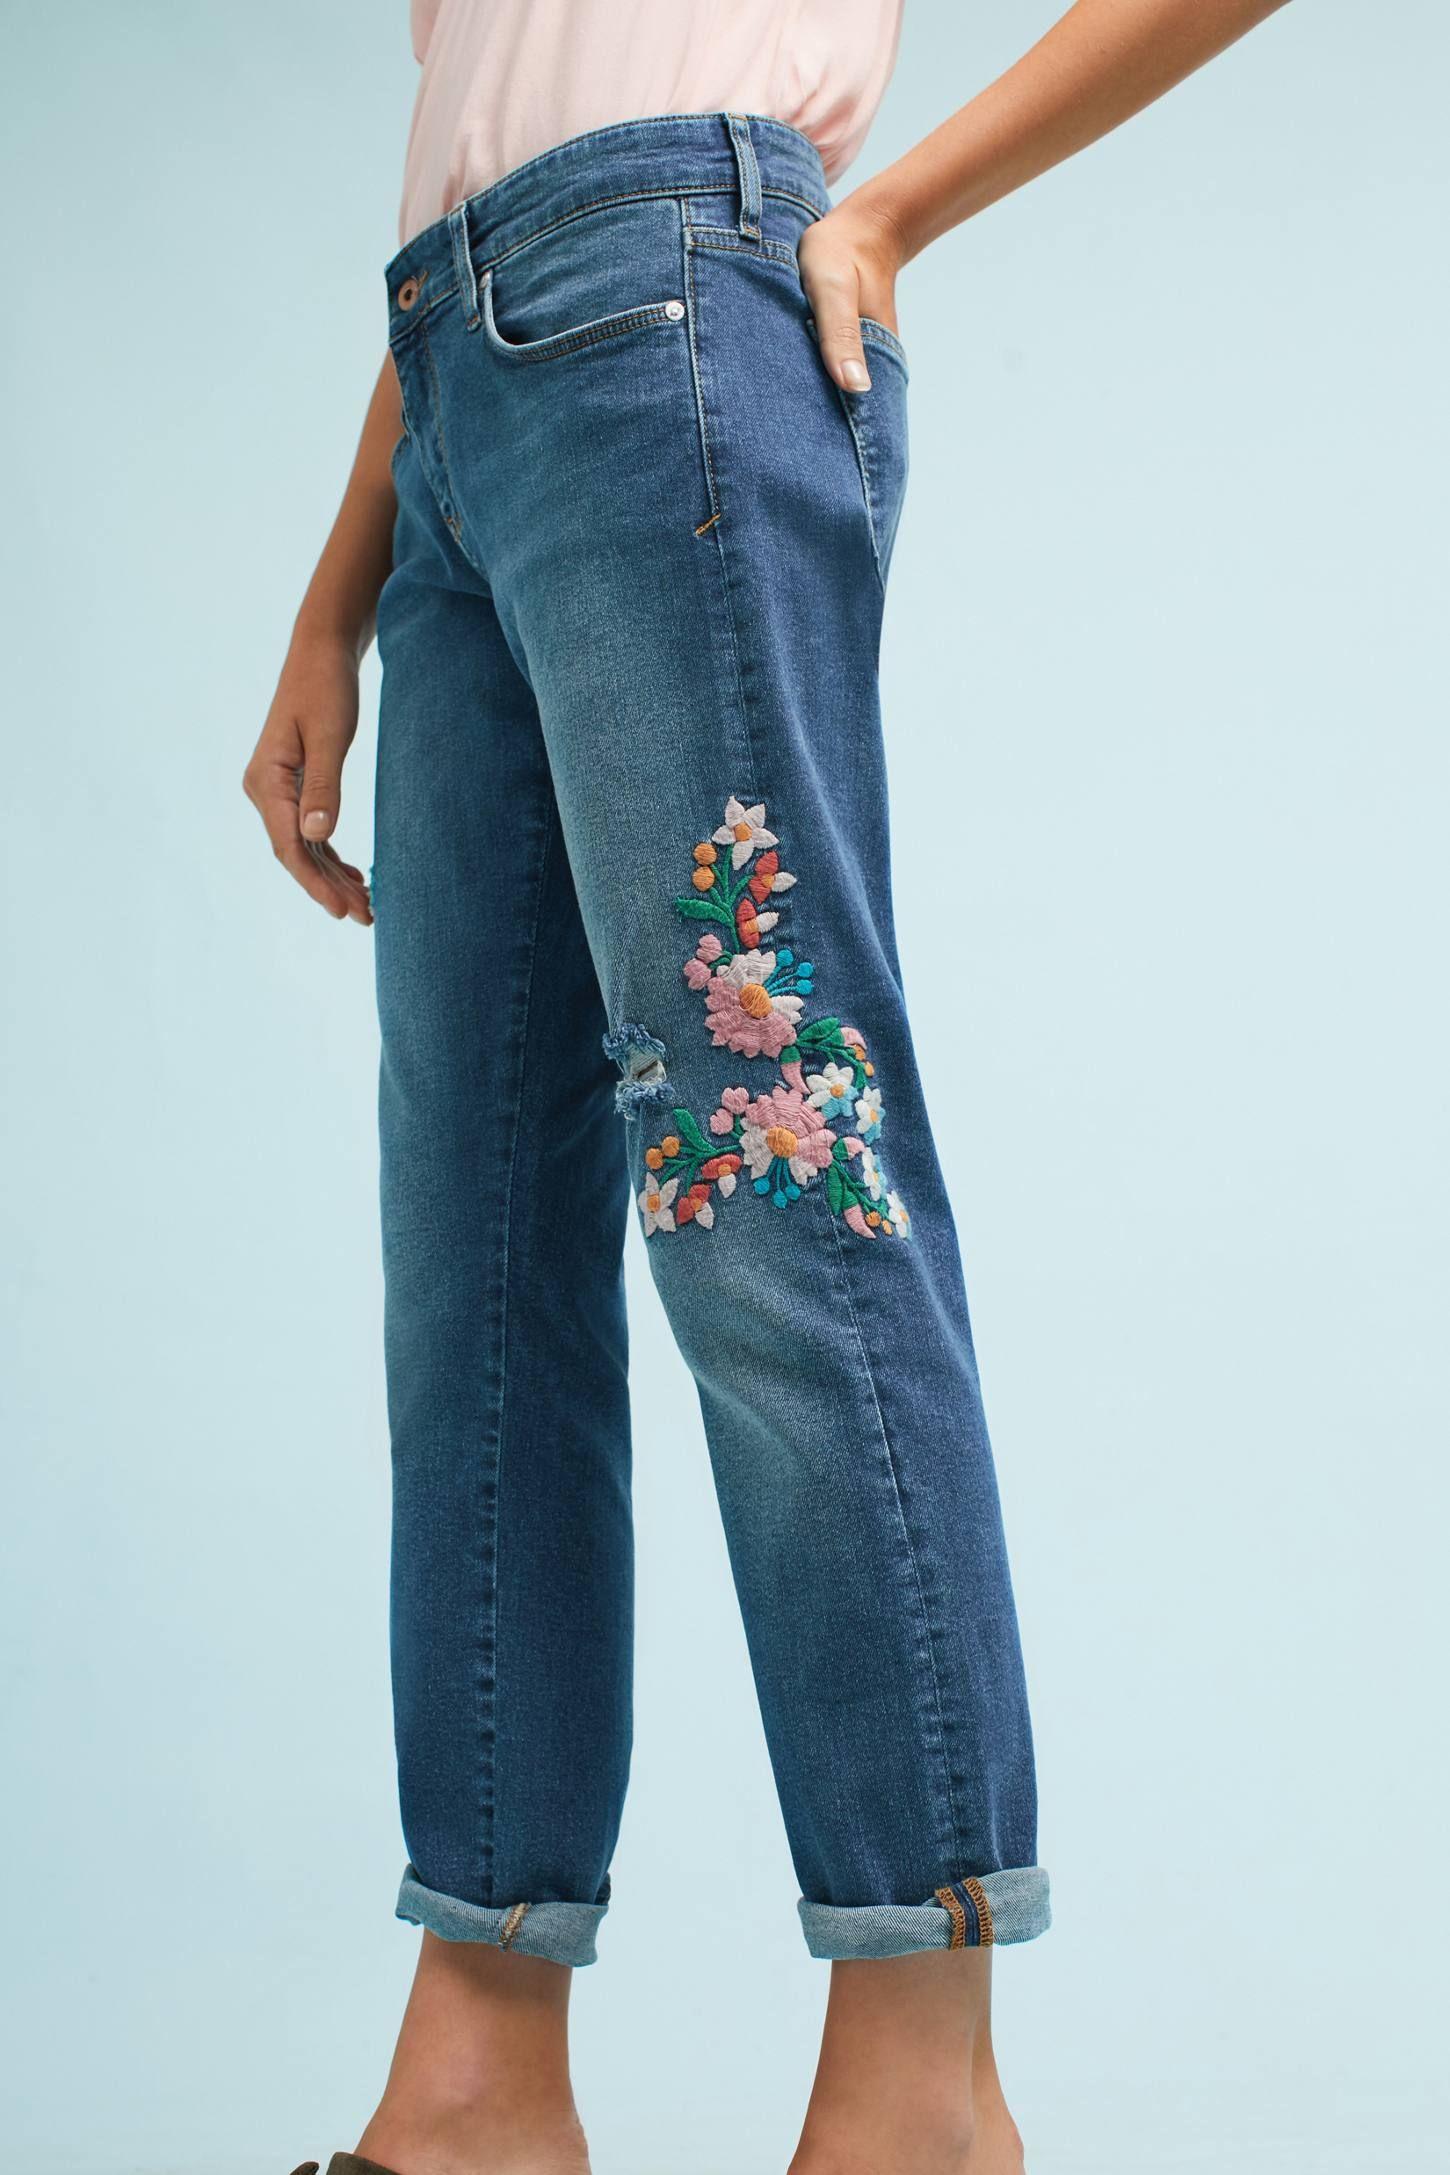 Pilcro Mid-Rise Slim Boyfriend Jeans   DETAIL HUB ...